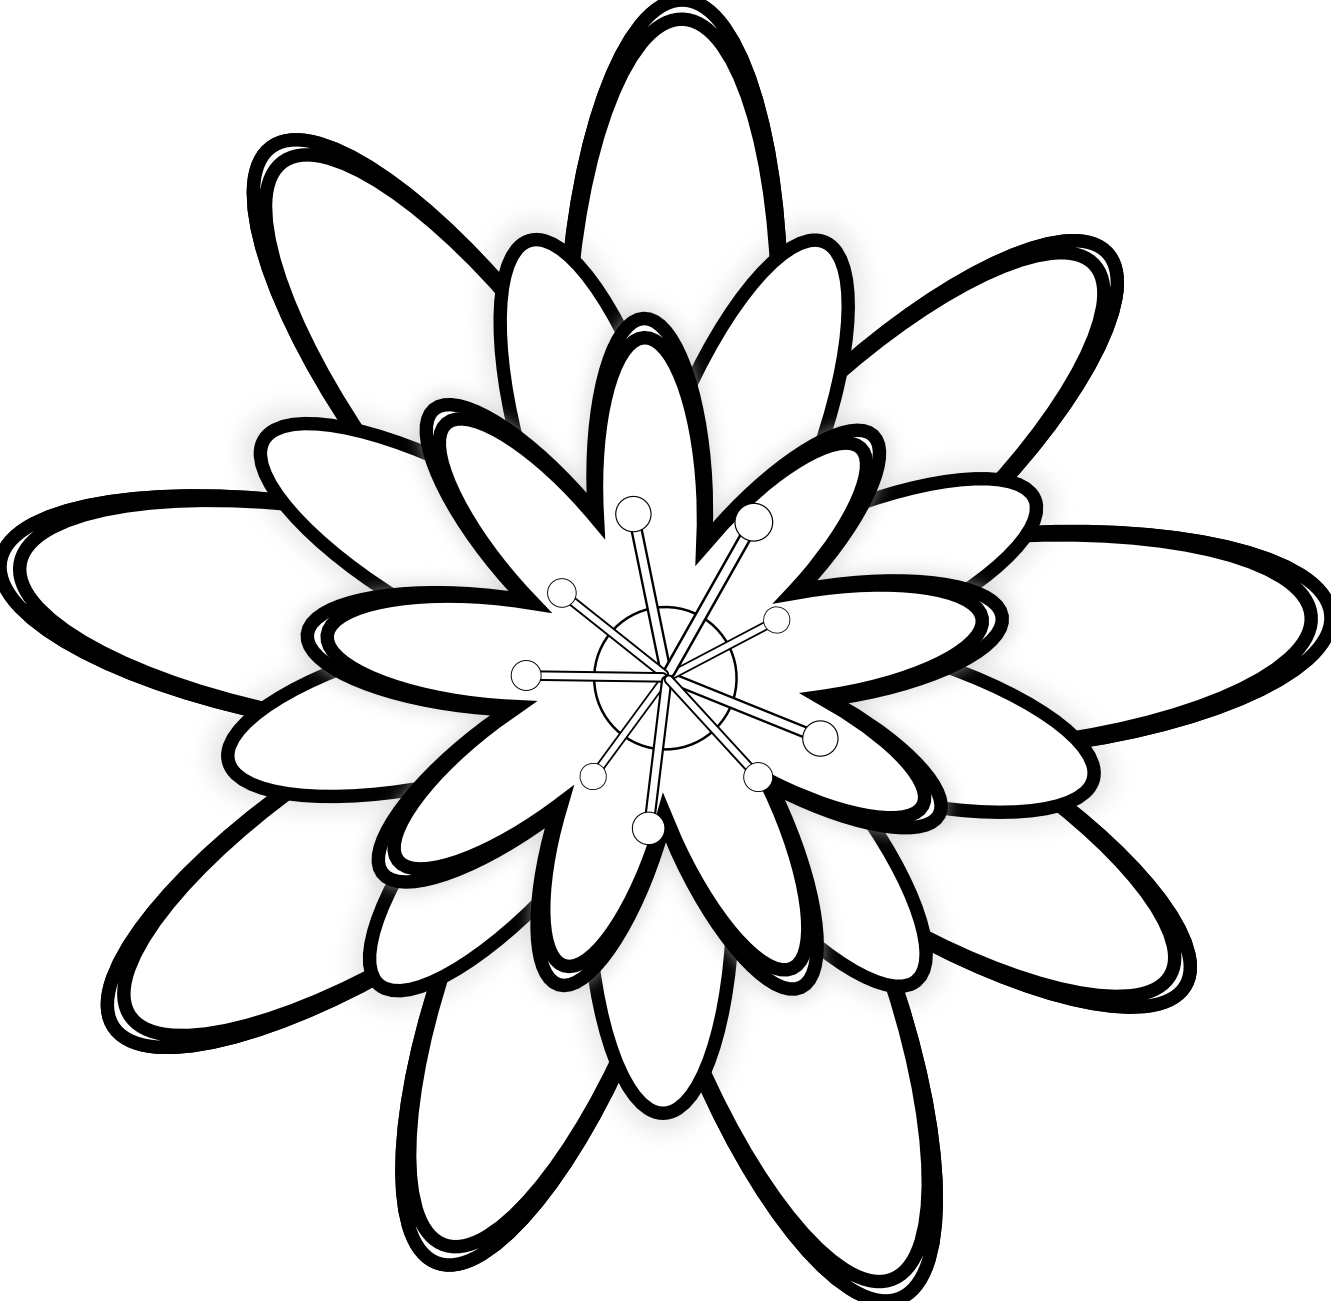 Nail Art Hitam Putih: Gambar Hitam Putih